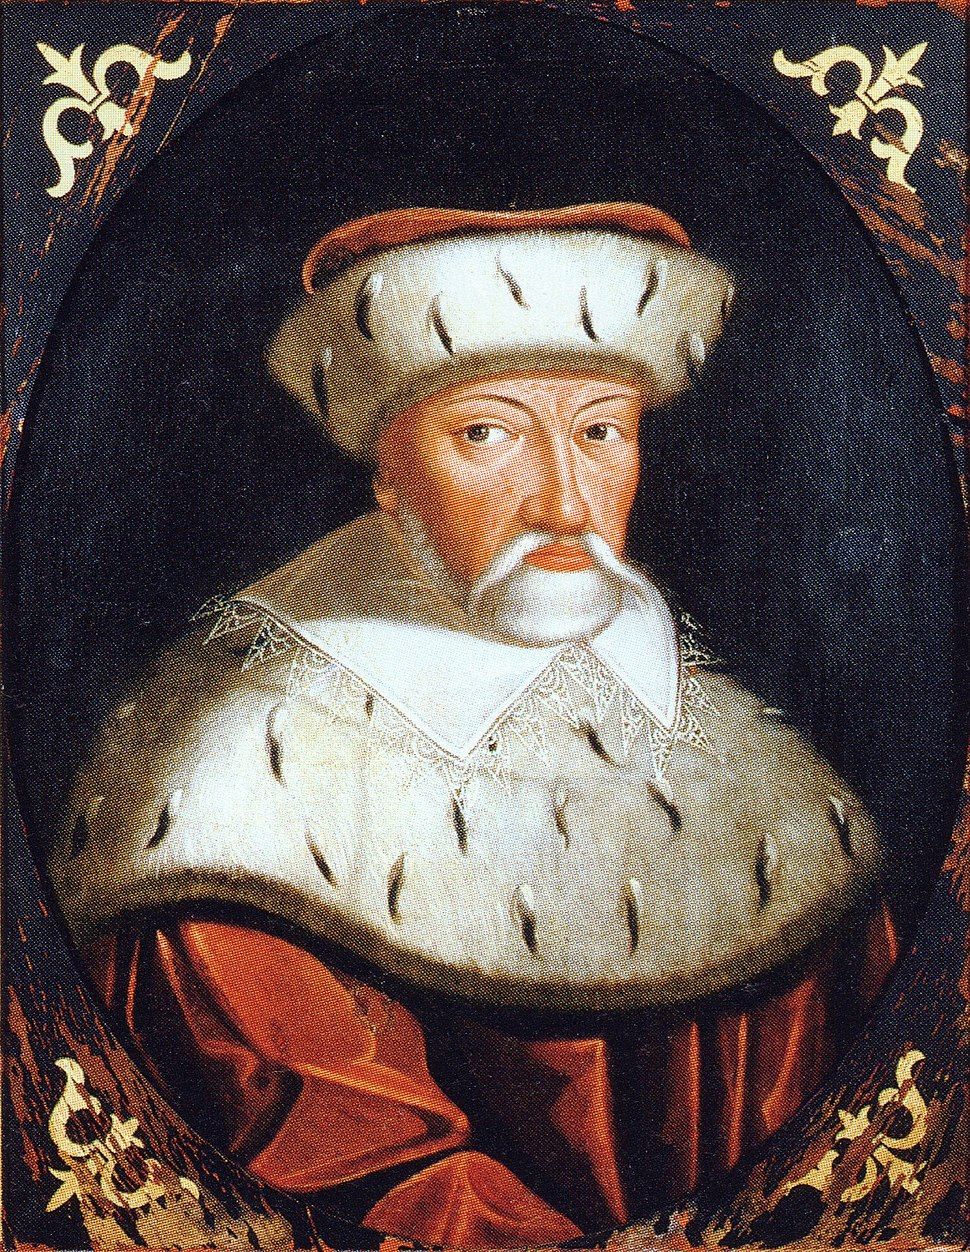 JoachimFriedrichBrandenburg1600